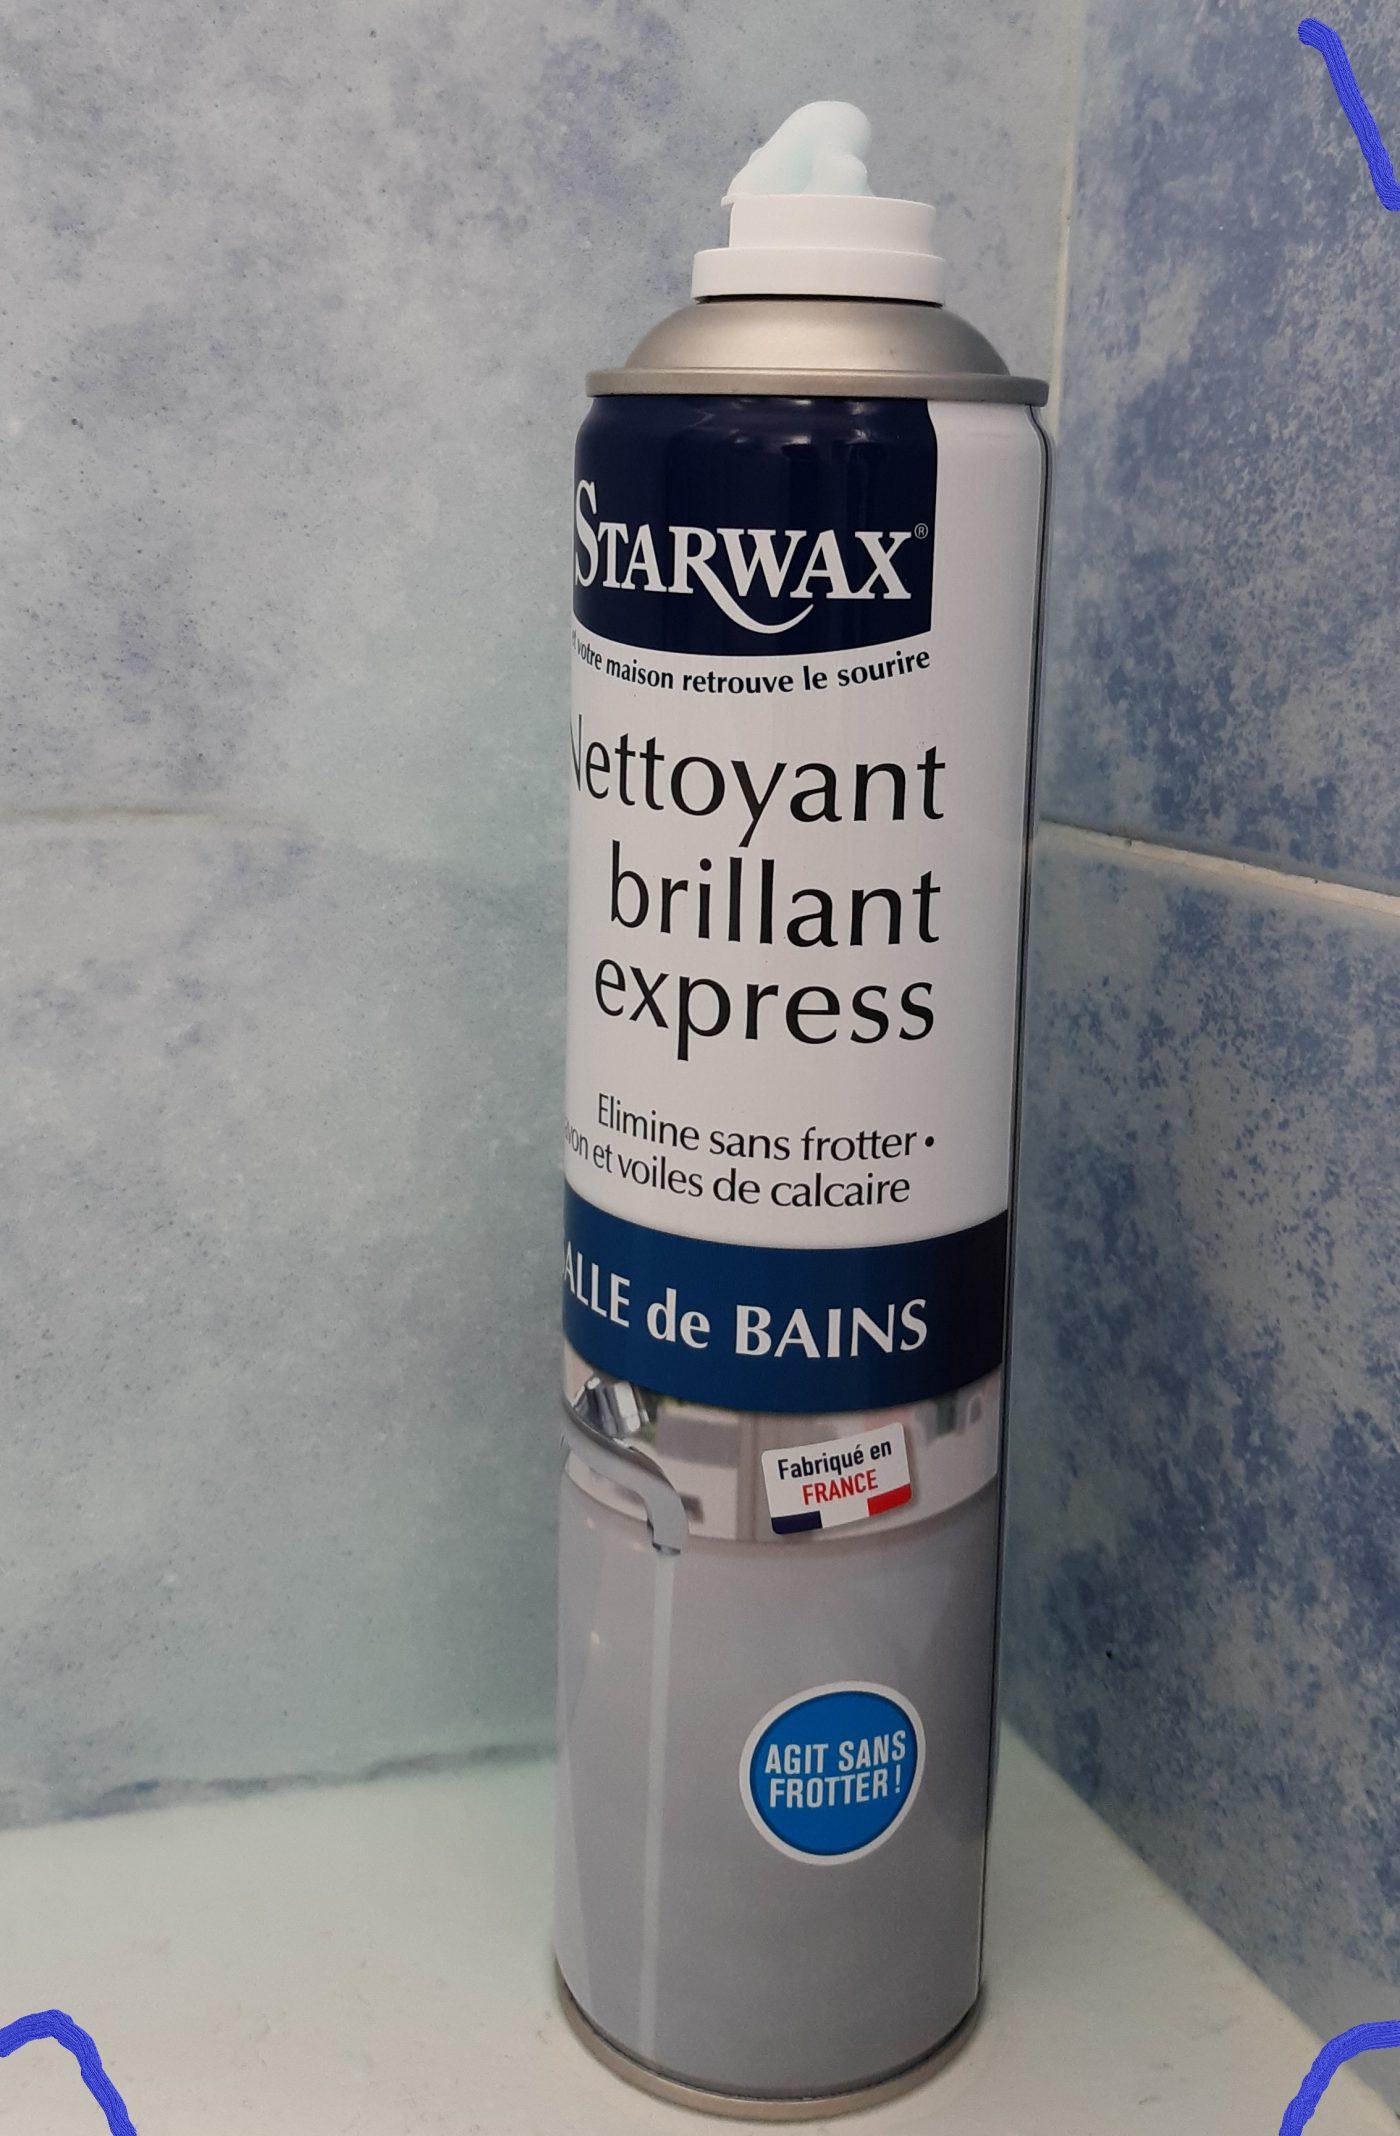 Nettoyant express pour salle de bain    Starwax 👍👍